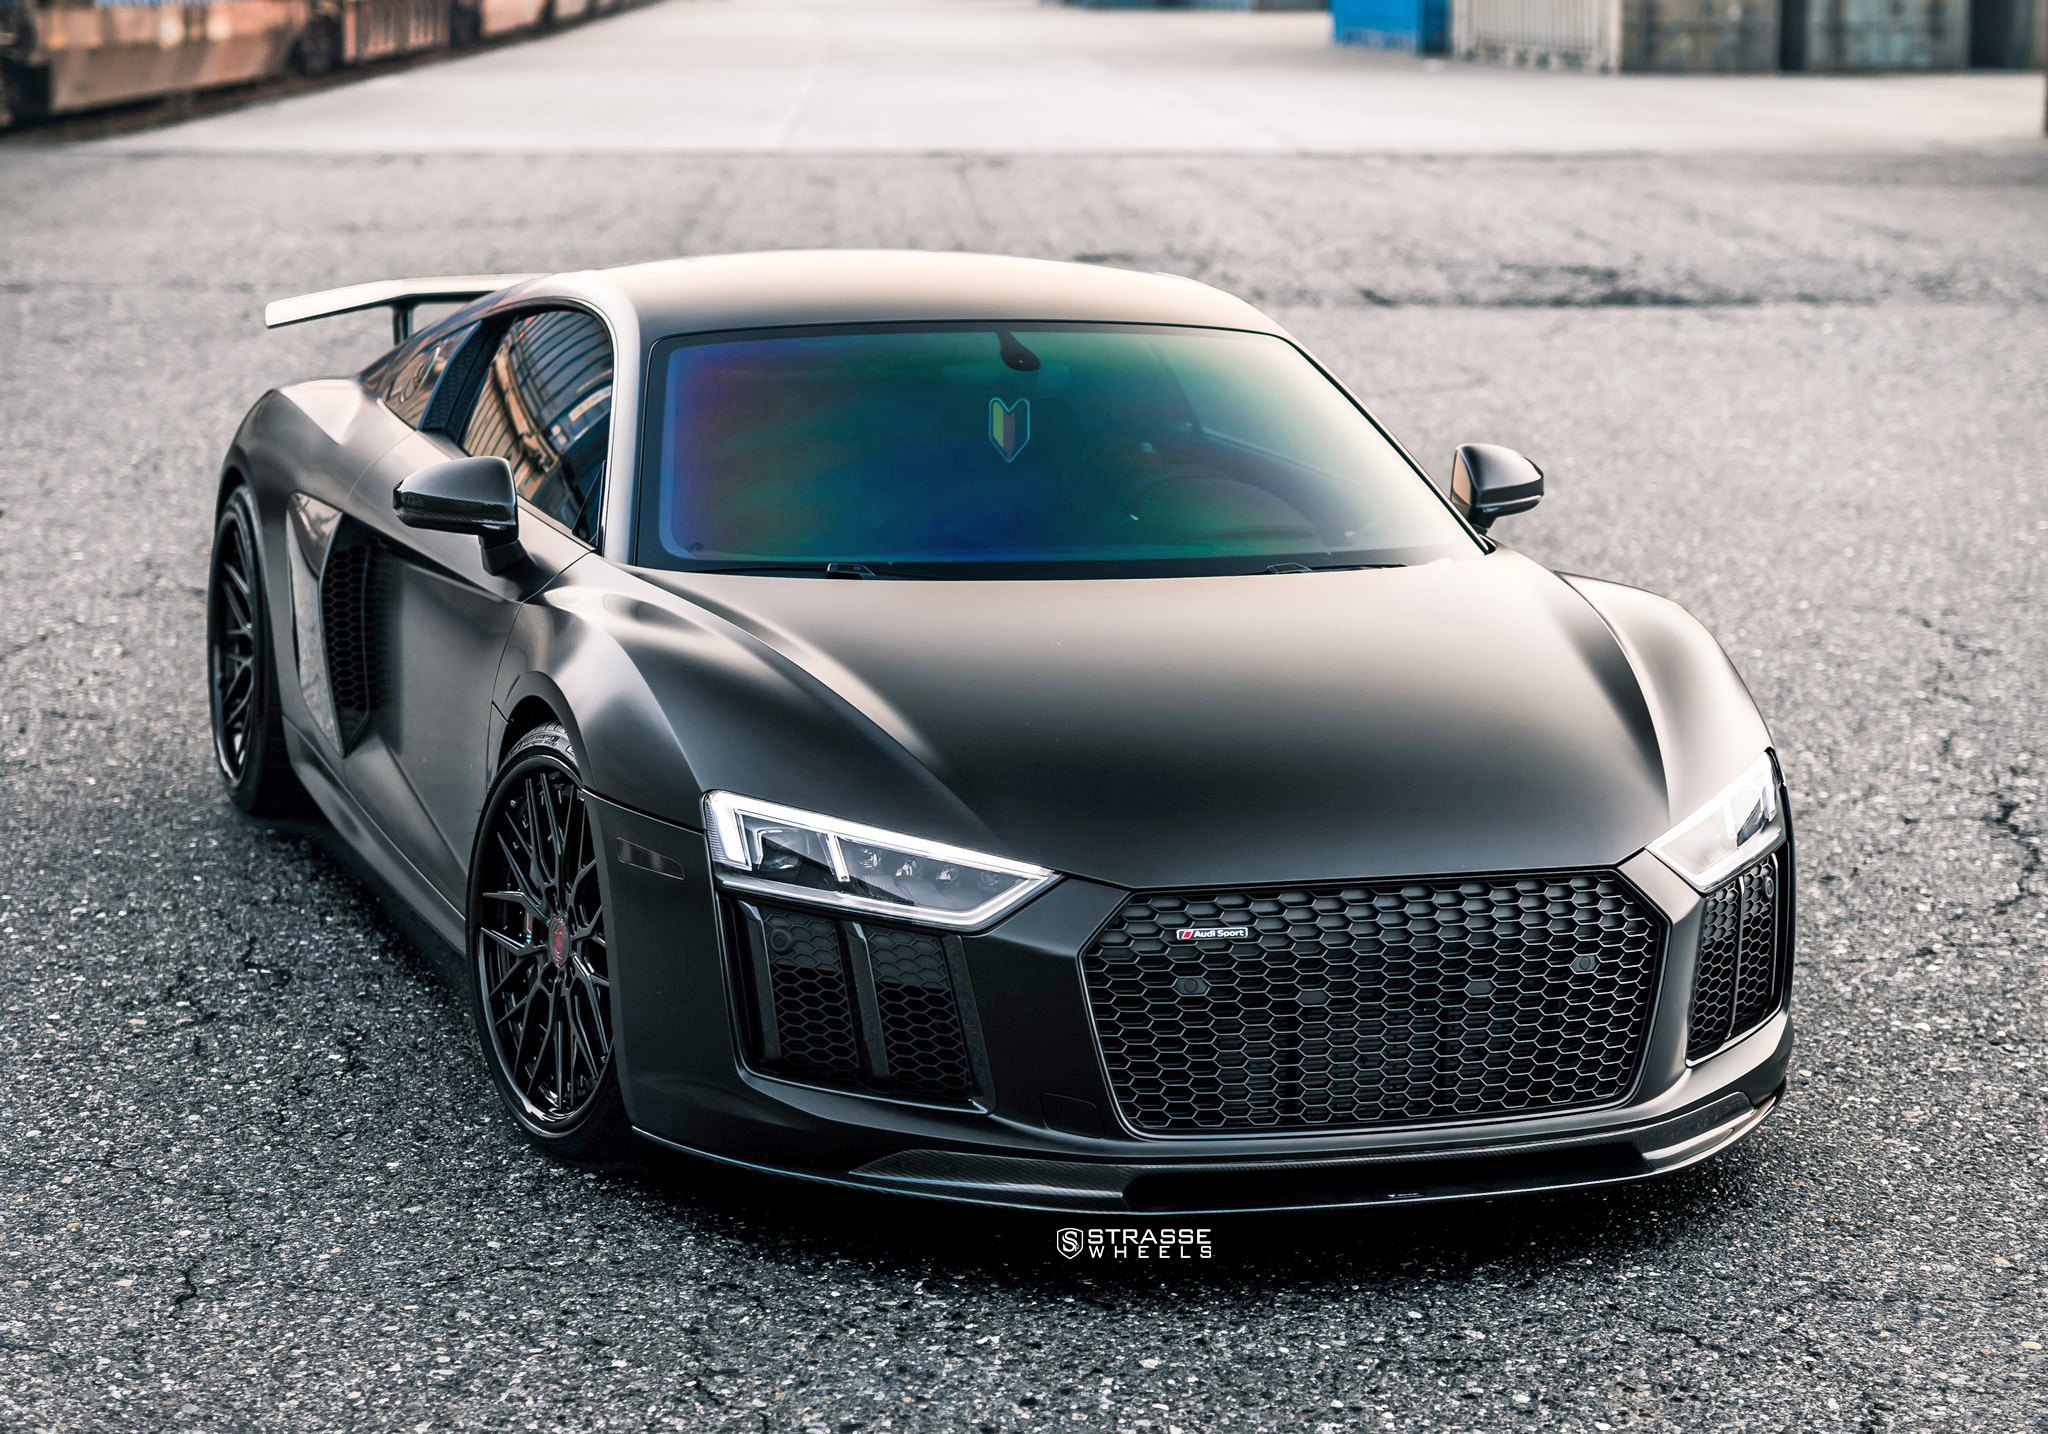 Custom Body Kit Dramatically Changes Black Audi R8 Carid Com Gallery